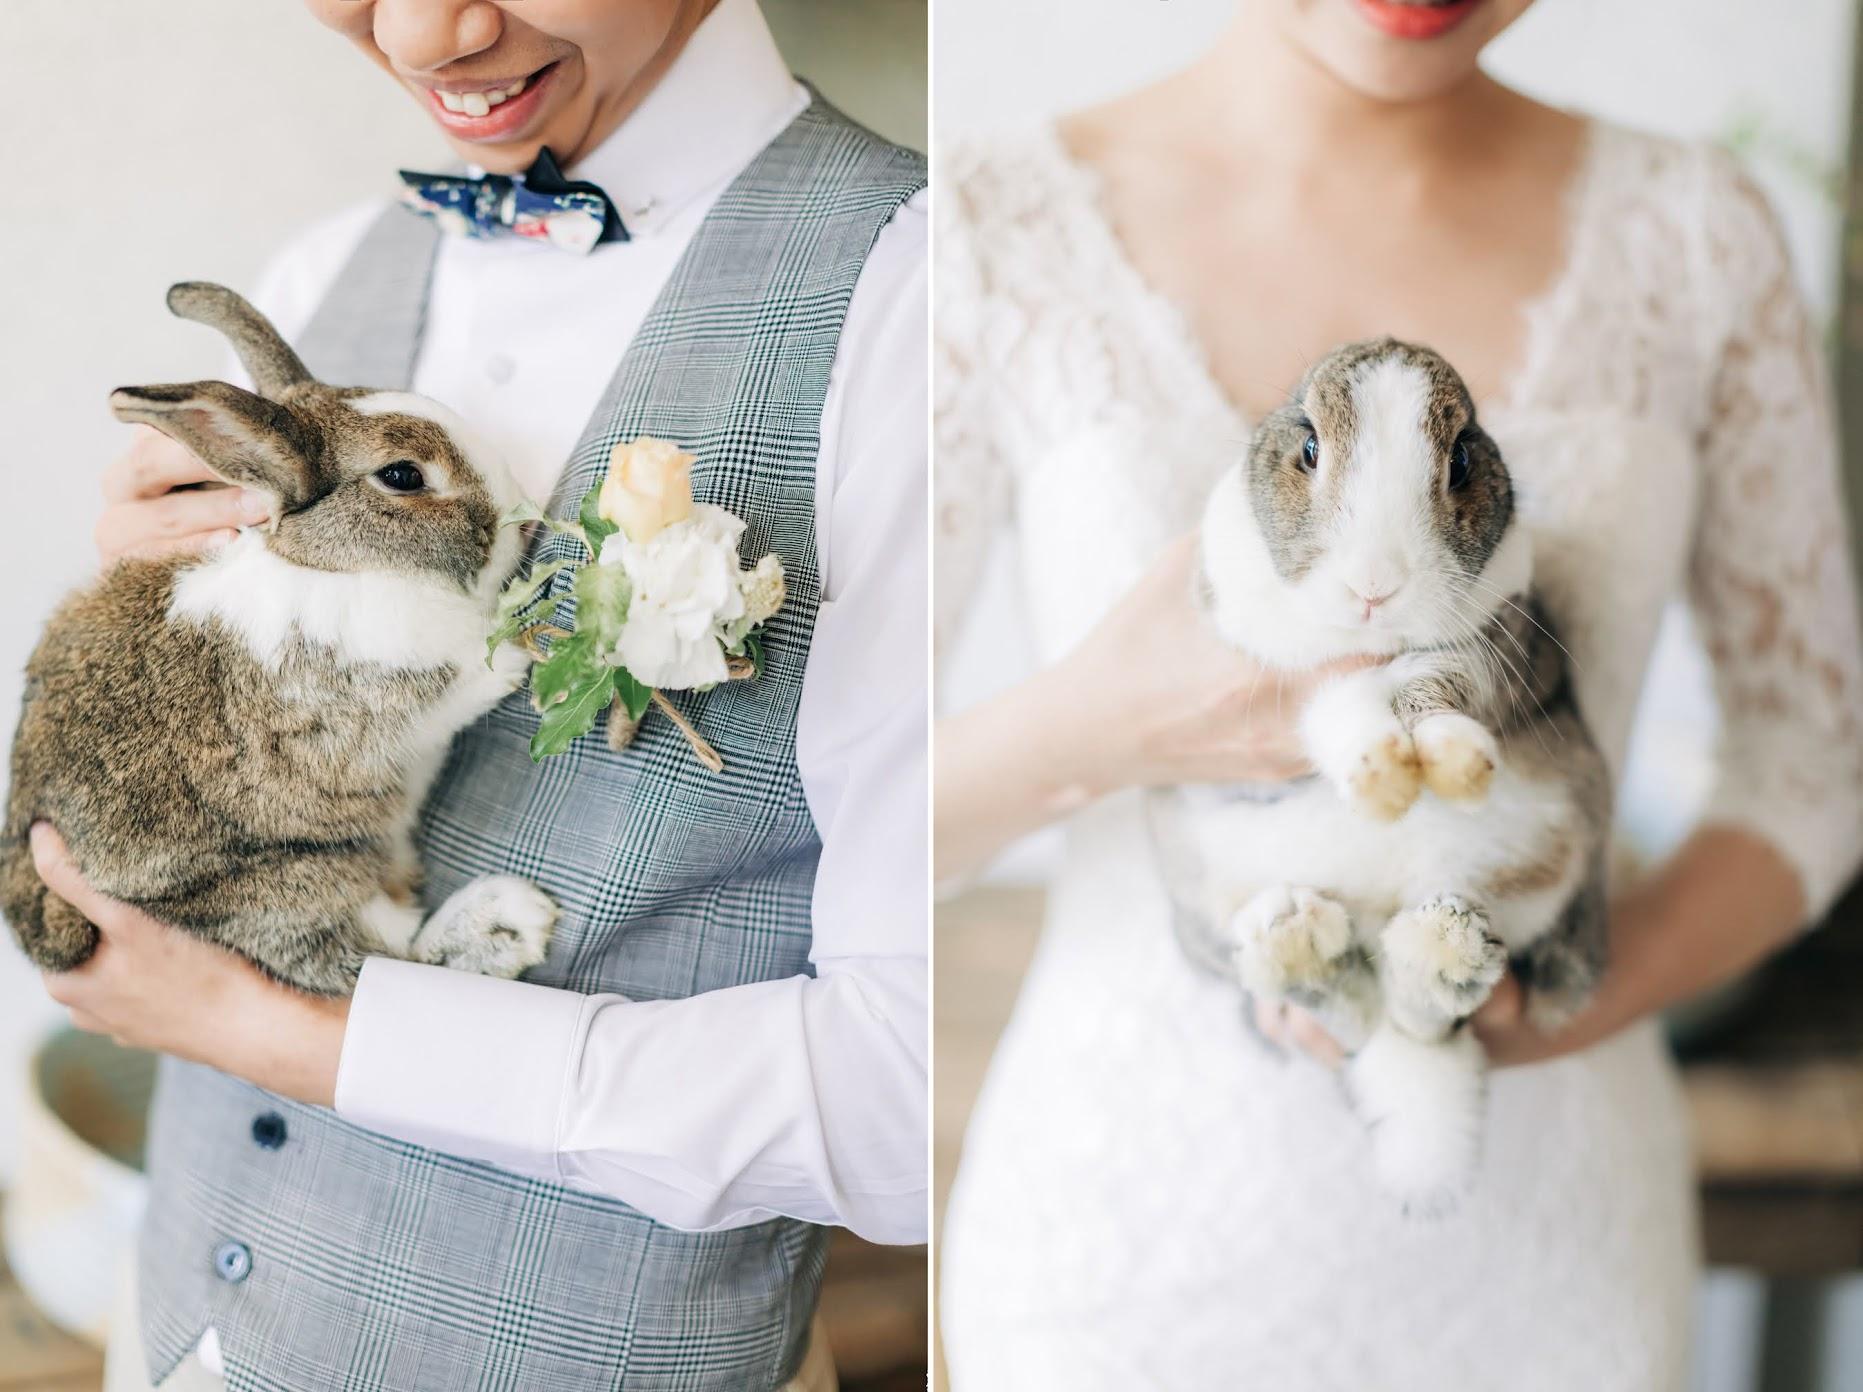 寵物婚紗兔子篇 | Fish + Wolf Engagement | 毛小孩婚紗 - 美式風格婚紗